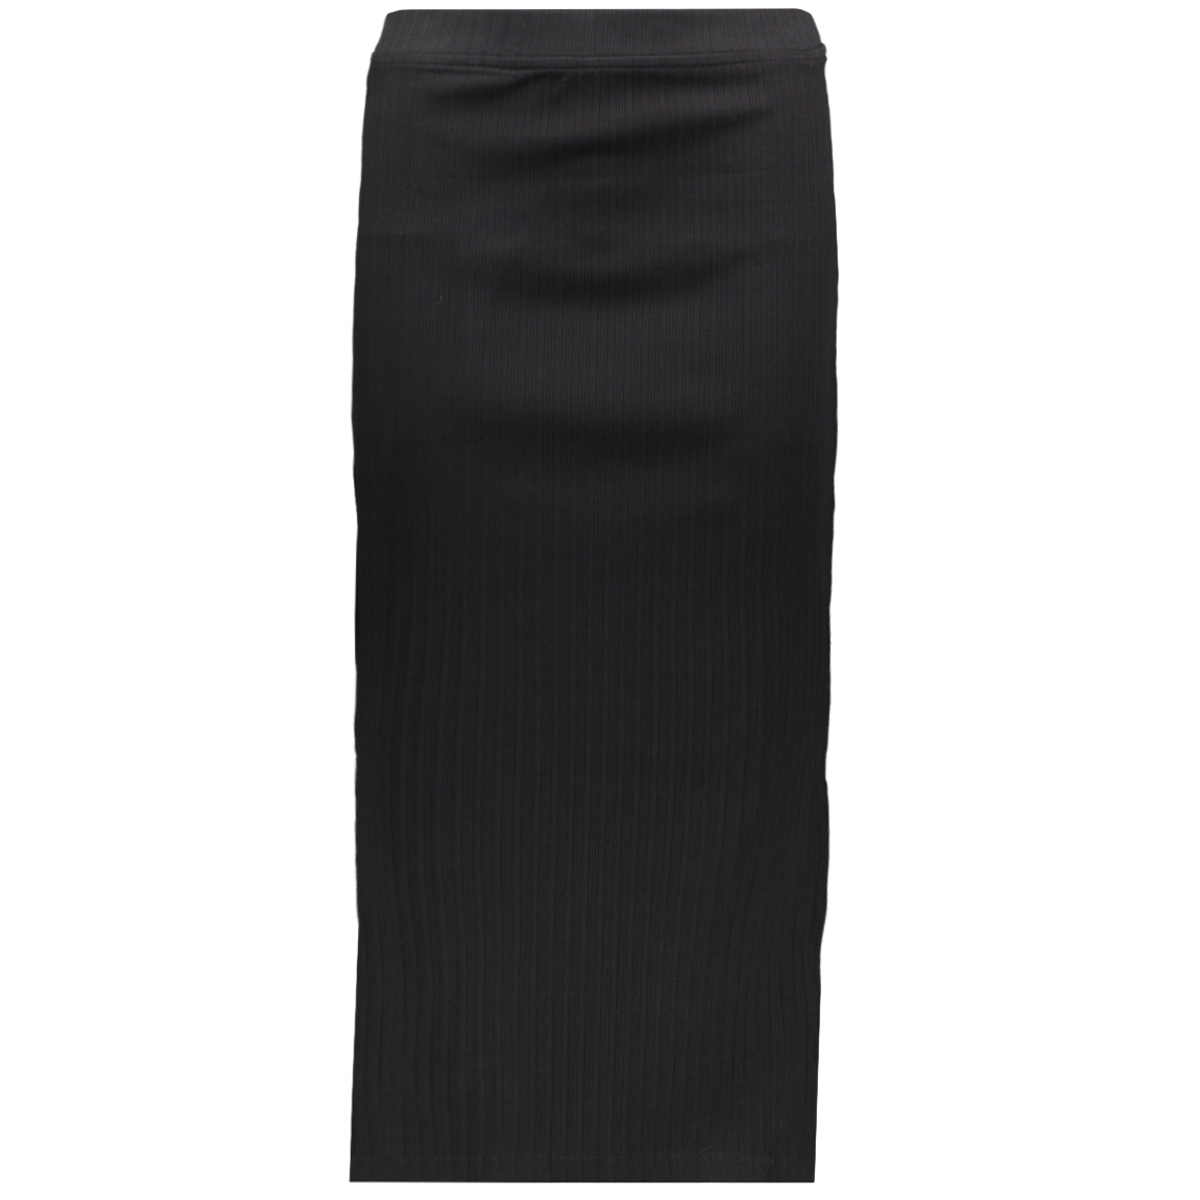 nmmonica hw pencil skirt bg 27010551 noisy may rok black